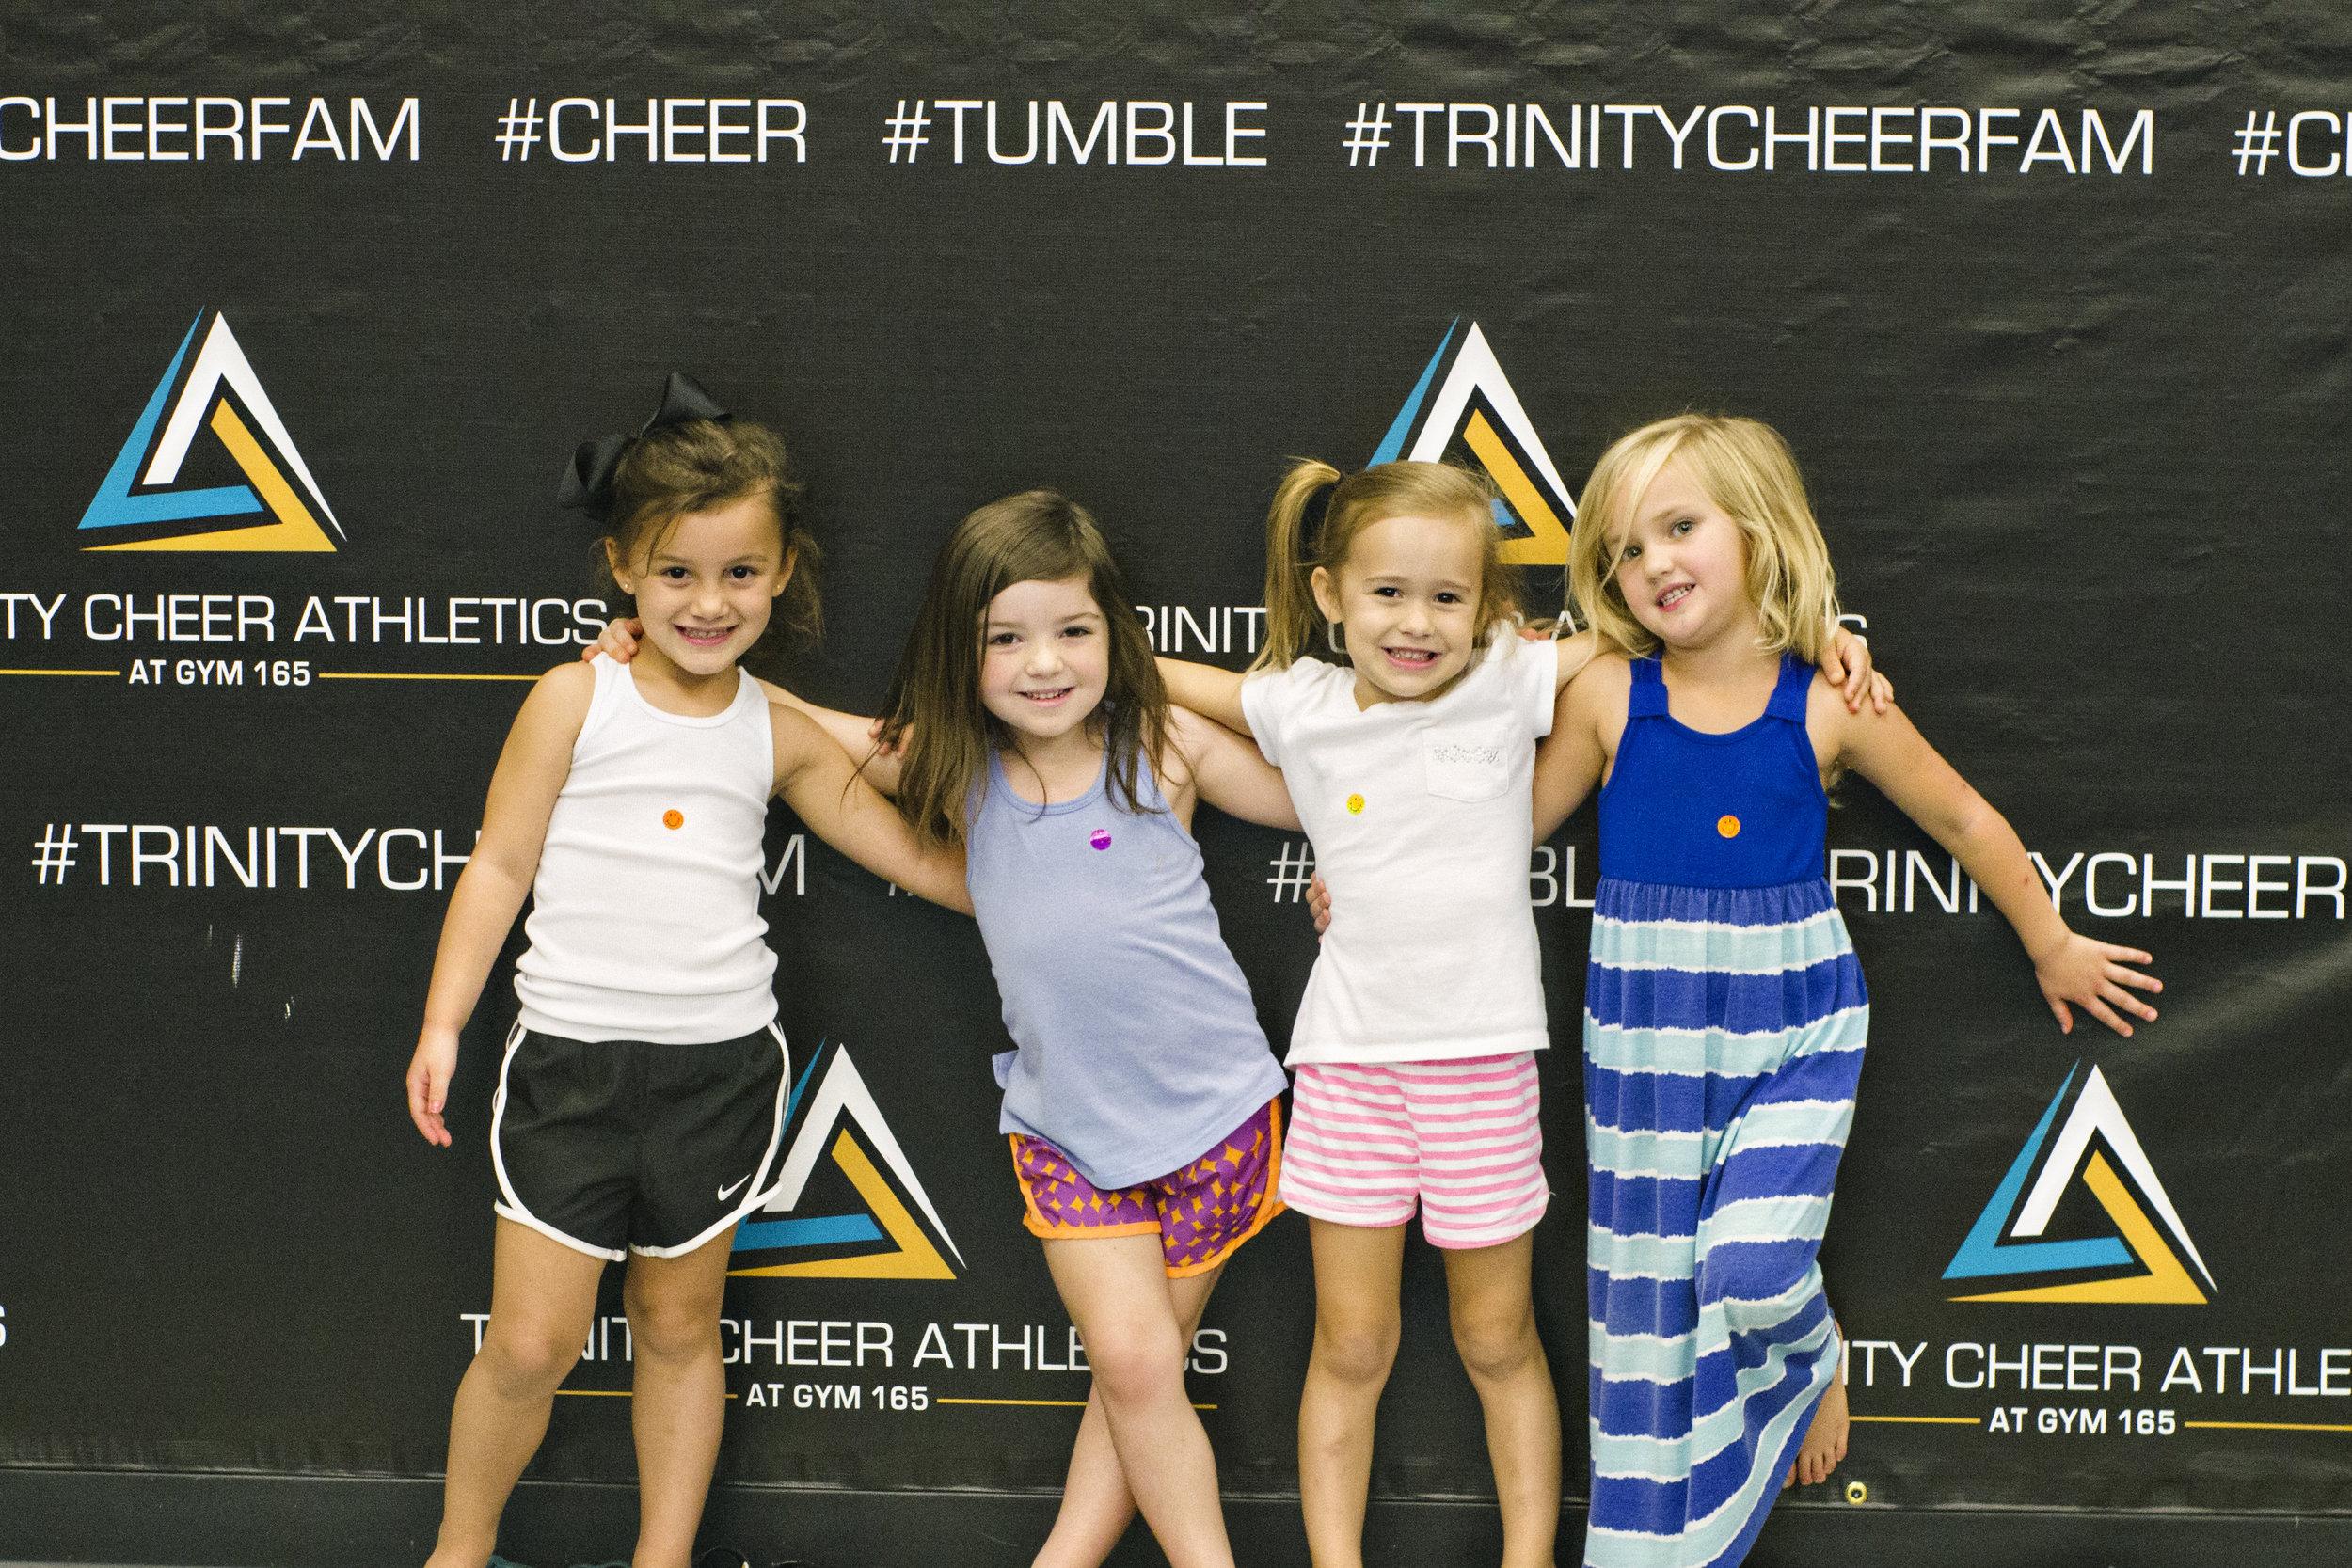 Trinity_Cheer_Athletics_Preschool_065.jpg